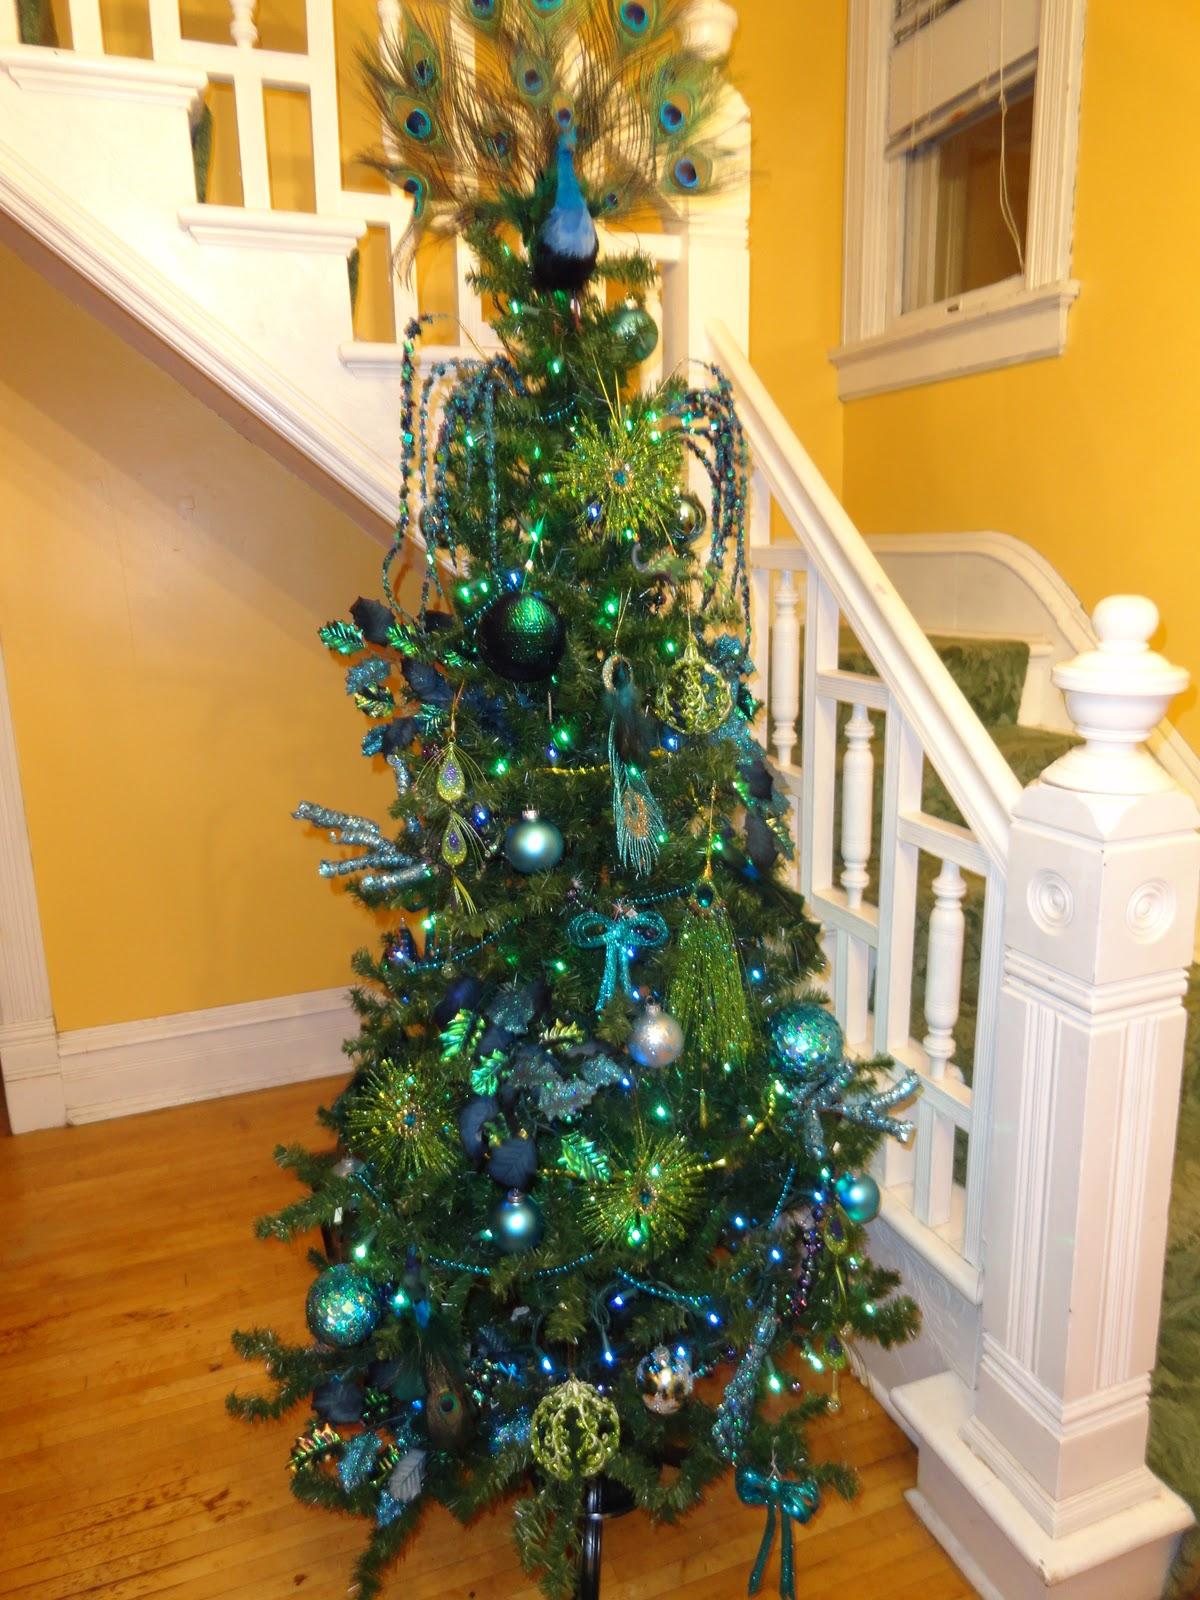 Le Beau Paon Victorien: Christmas Theme Tree 2011: Peacocks!